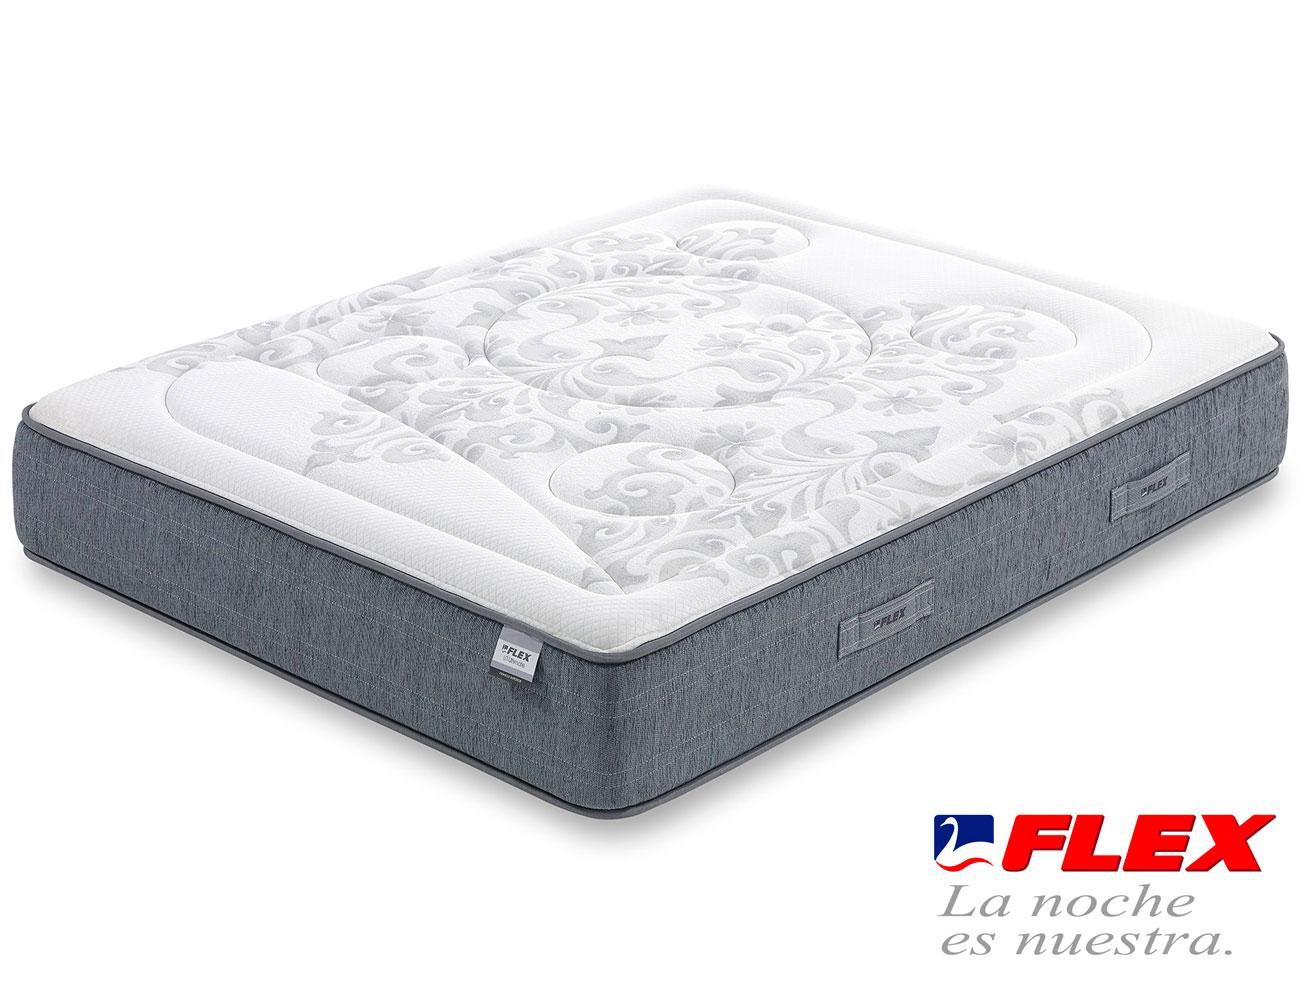 Colchon flex airvex viscoelastica gel garbi superior8